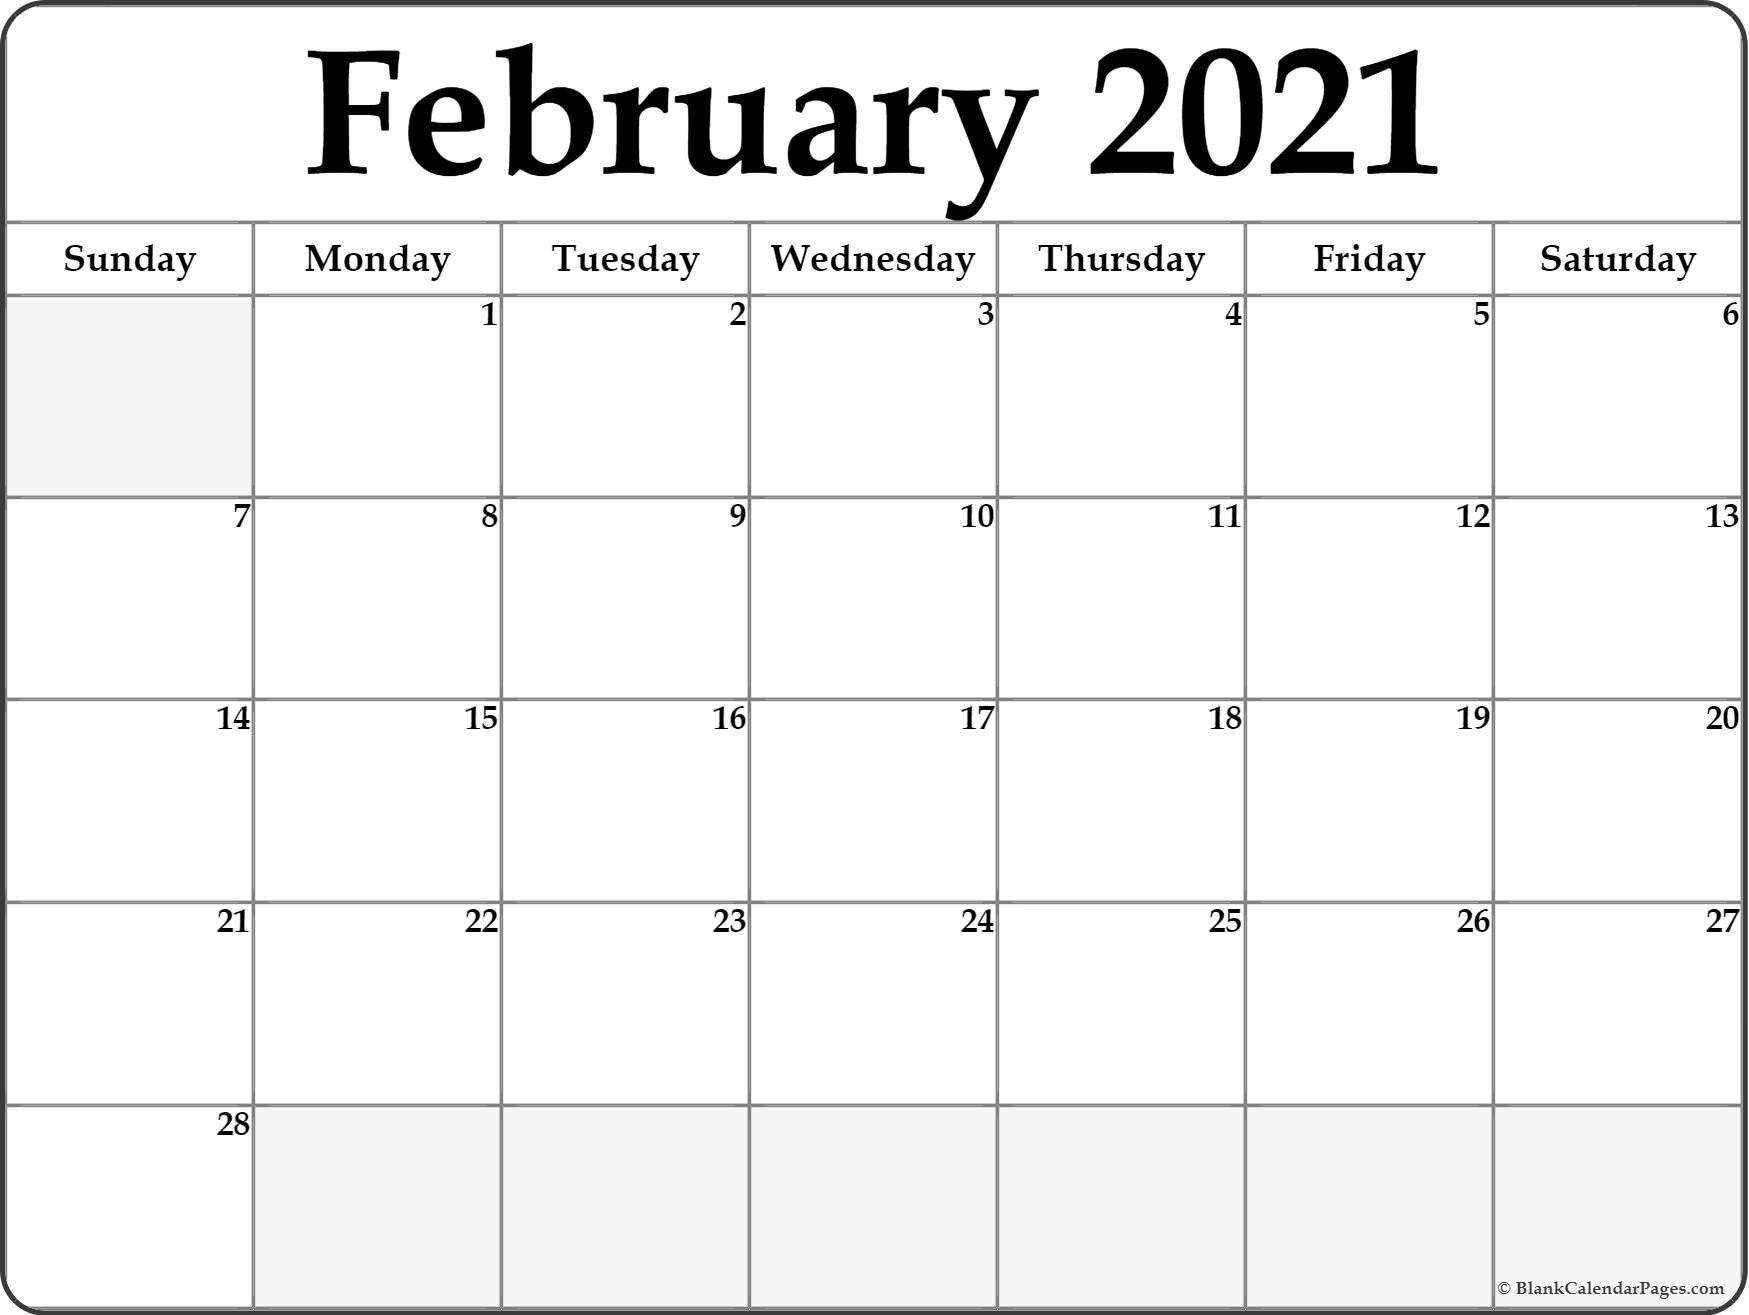 Calendar February 2021 Editable Planner In 2020 | February  2021 Free Printable Editable Monthly Calendar Template